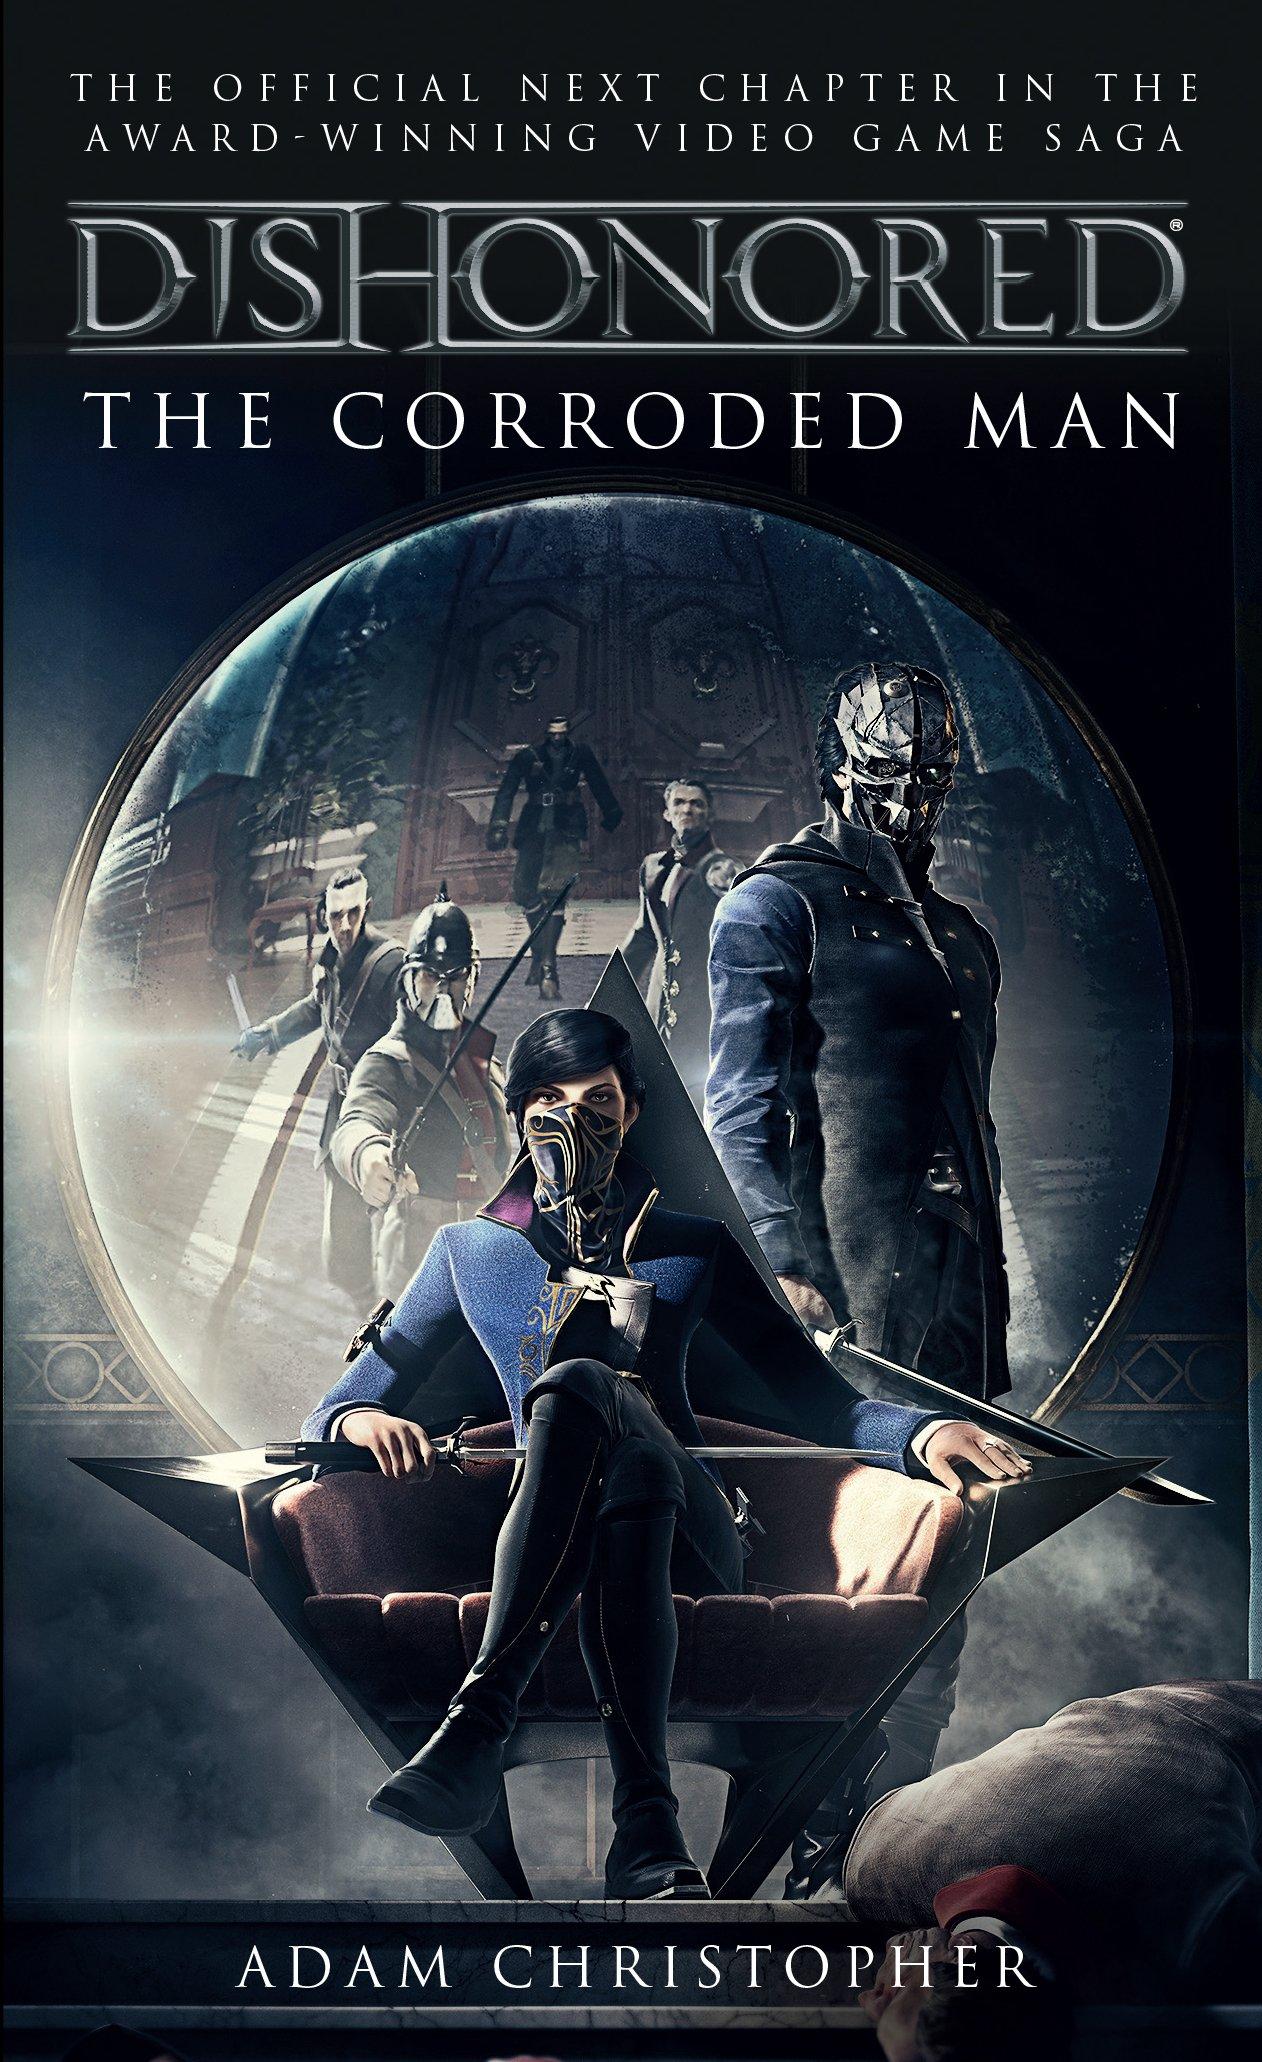 Dishonored: The Corroded Man Video Game Saga Idioma Inglés: Amazon.es: Christopher, Adam: Libros en idiomas extranjeros